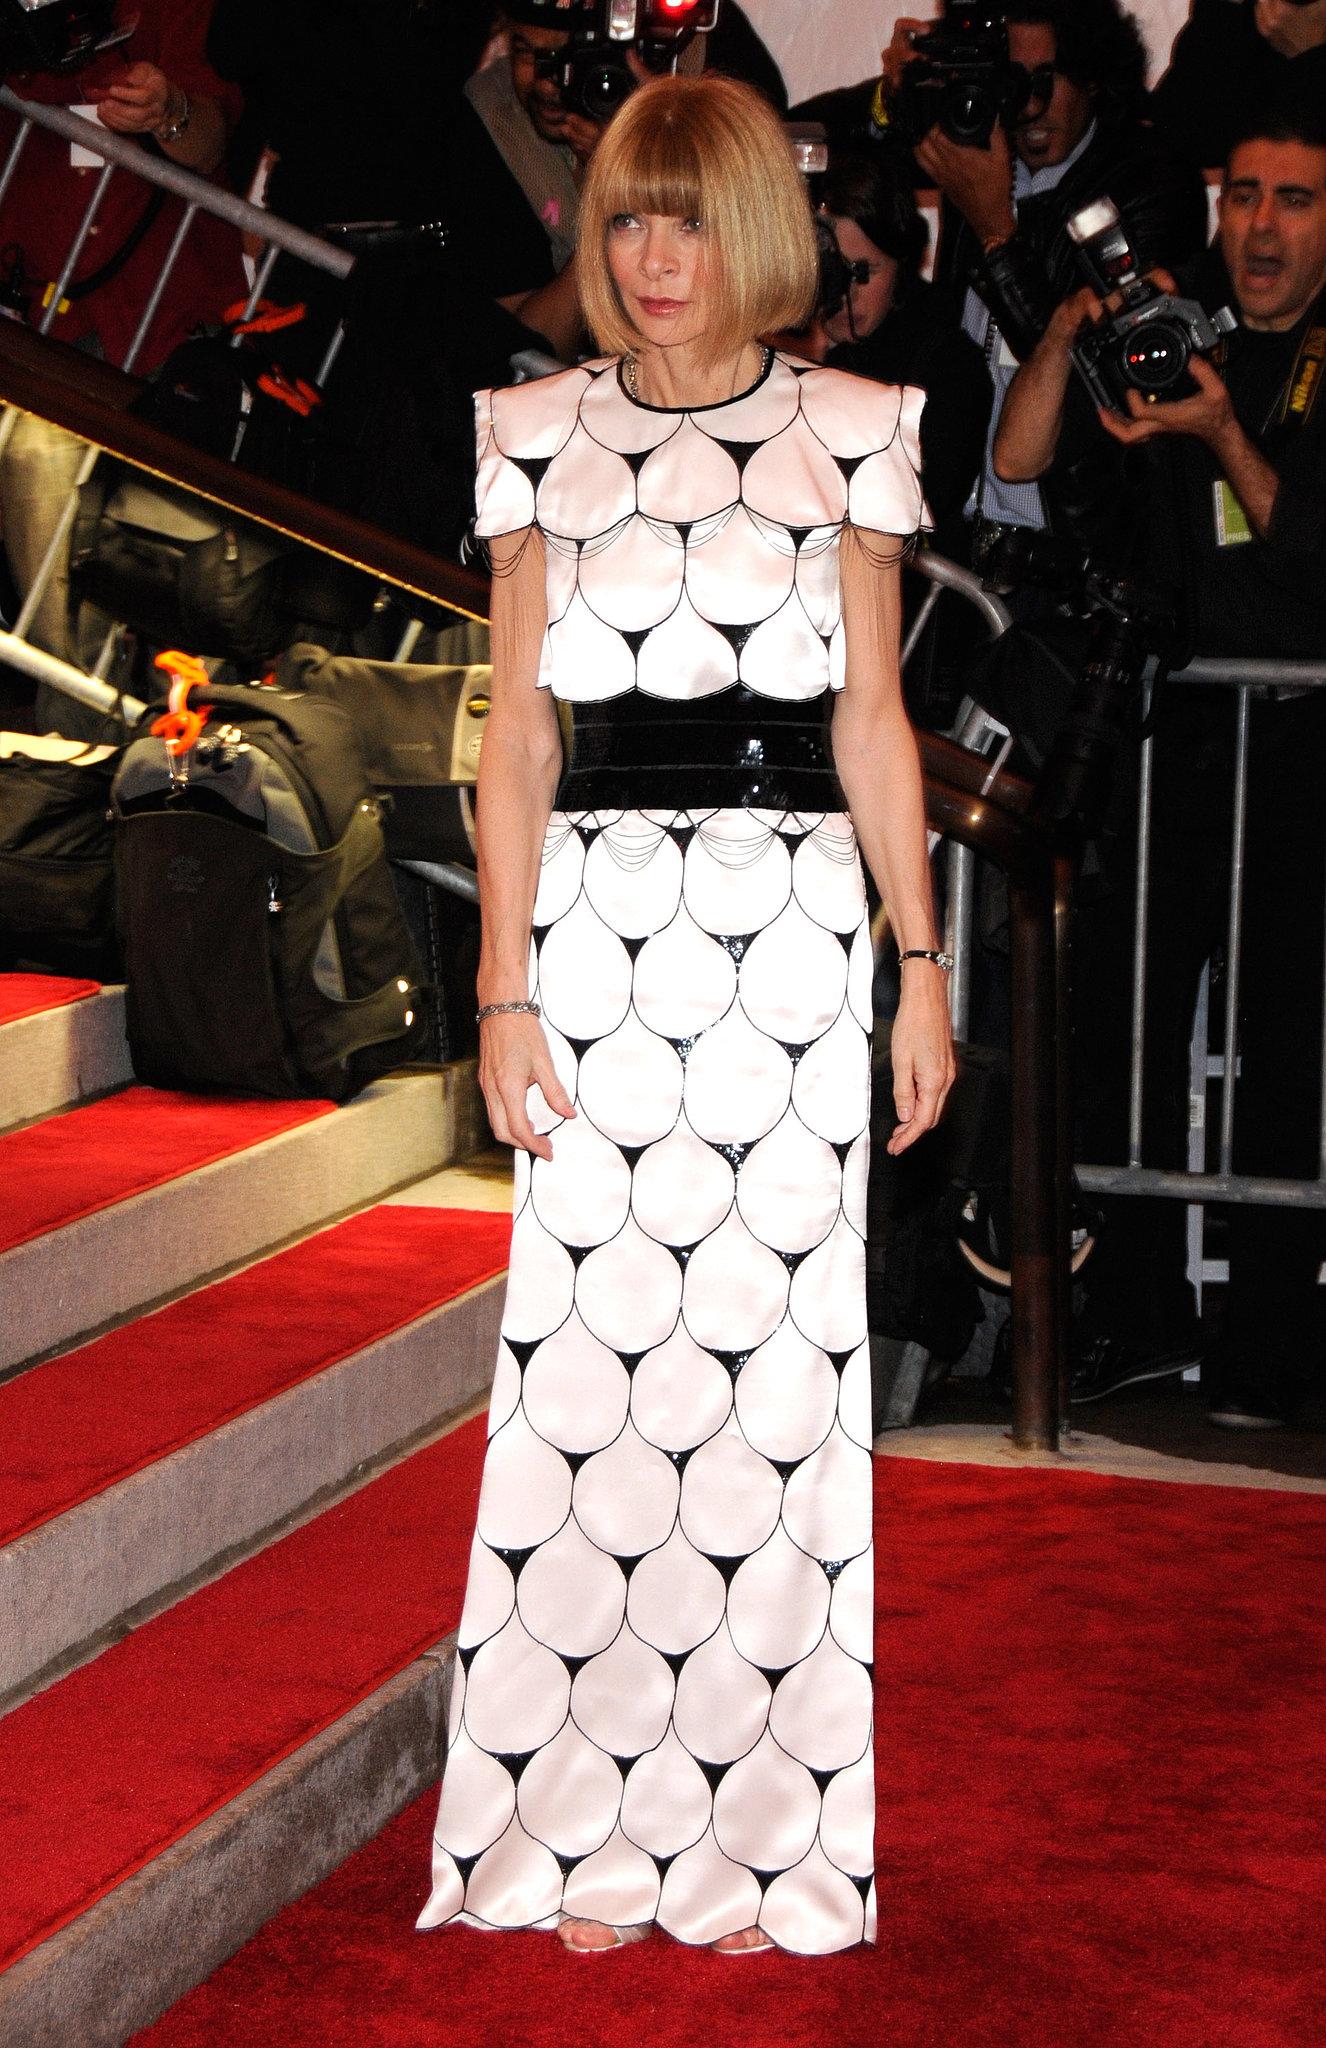 Anna Wintour's Met Gala Looks